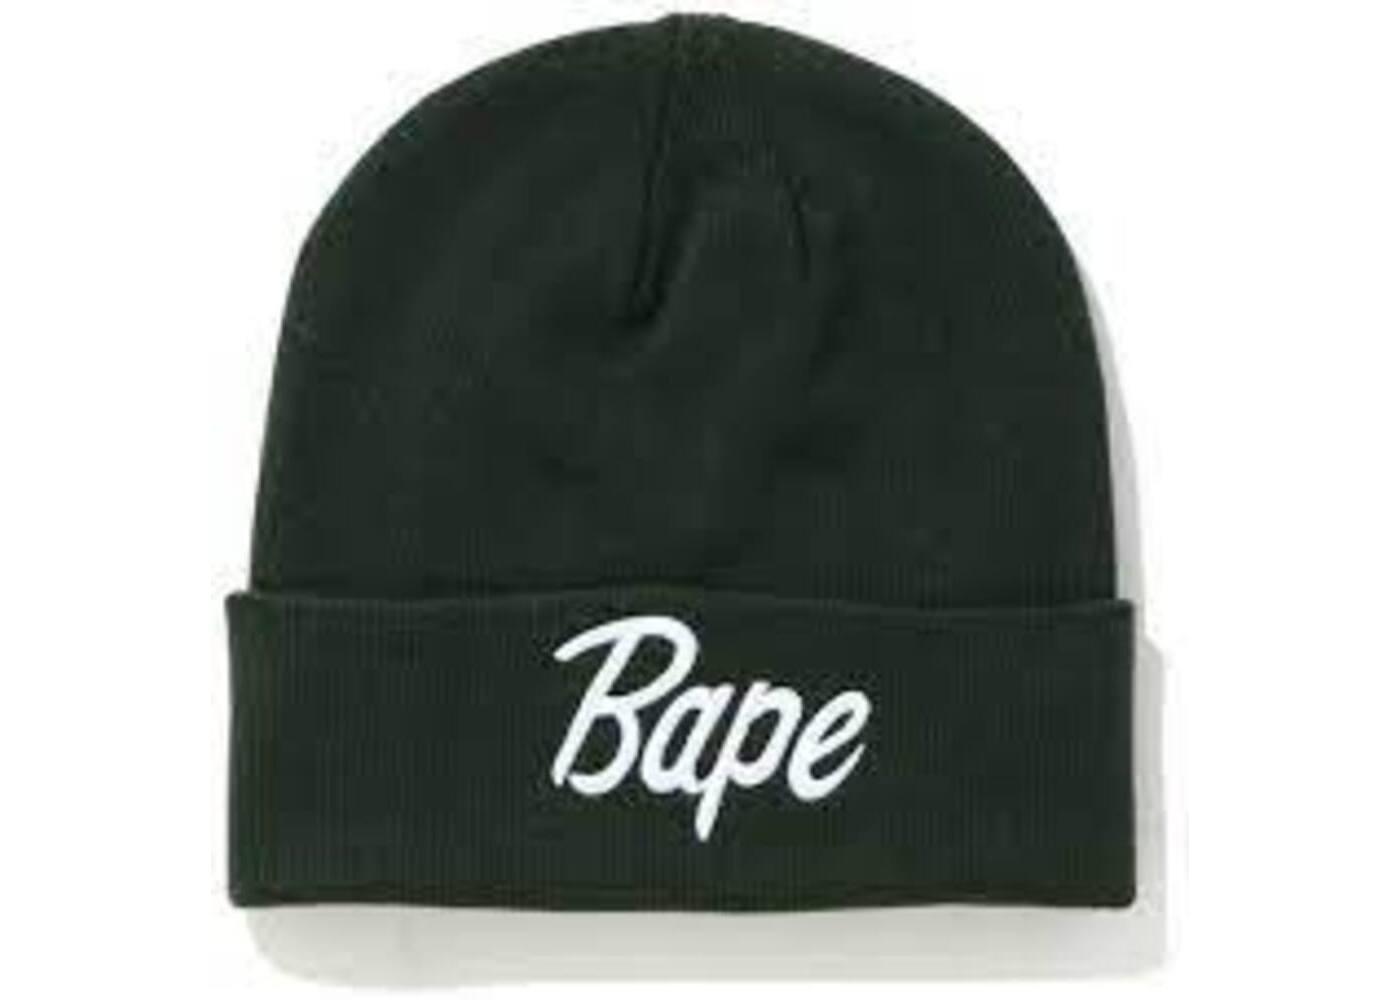 Bape Script Knit Beanie Green (SS20)の写真